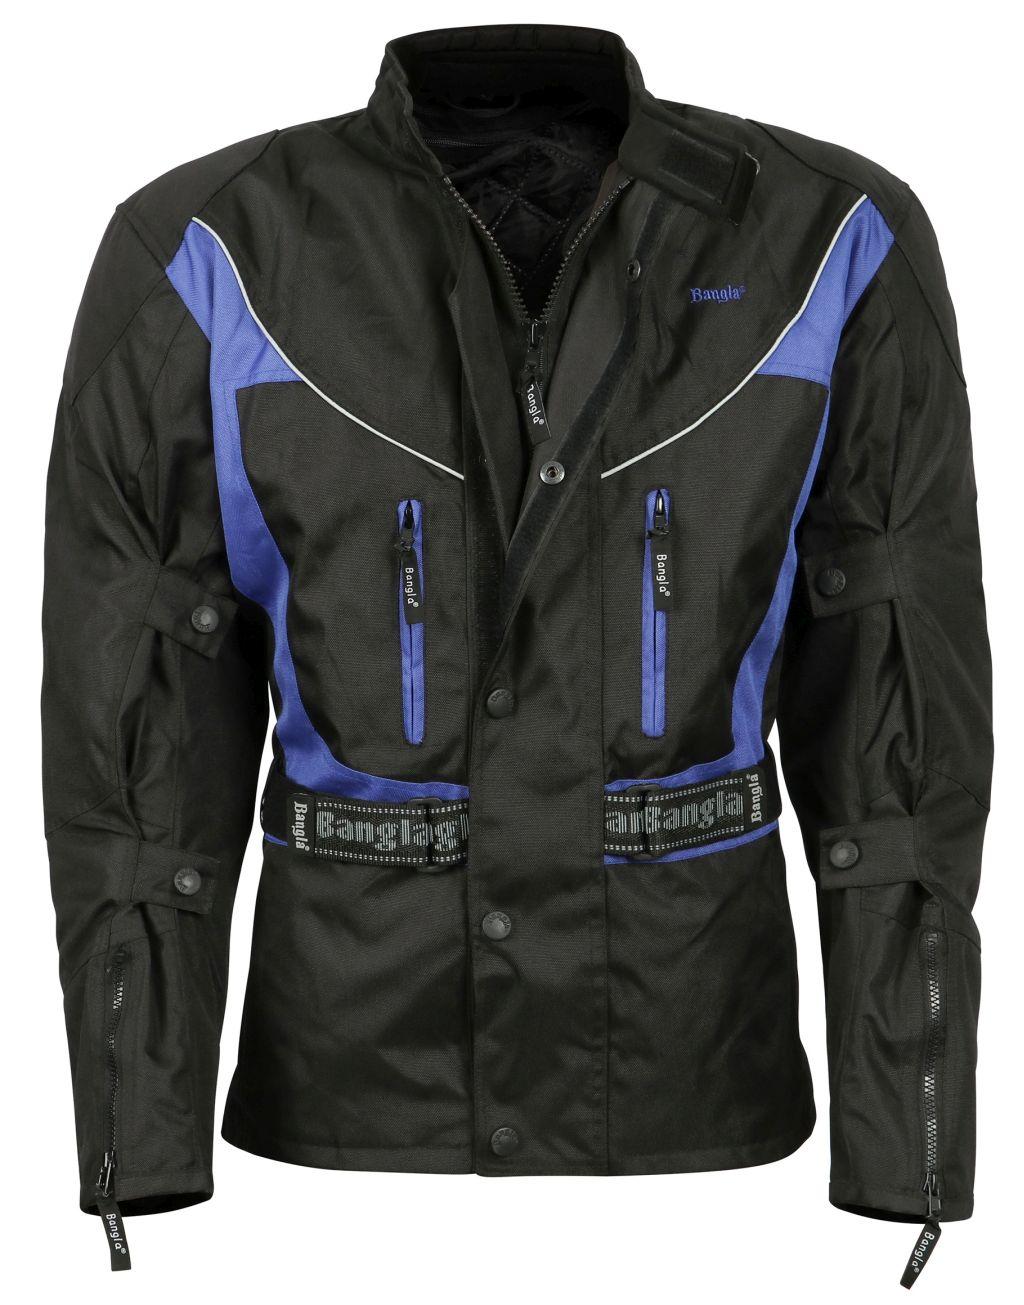 Bangla Motorrad Jacke Textil Motorradjacke Cordura Blau schwarz S - 6 XL